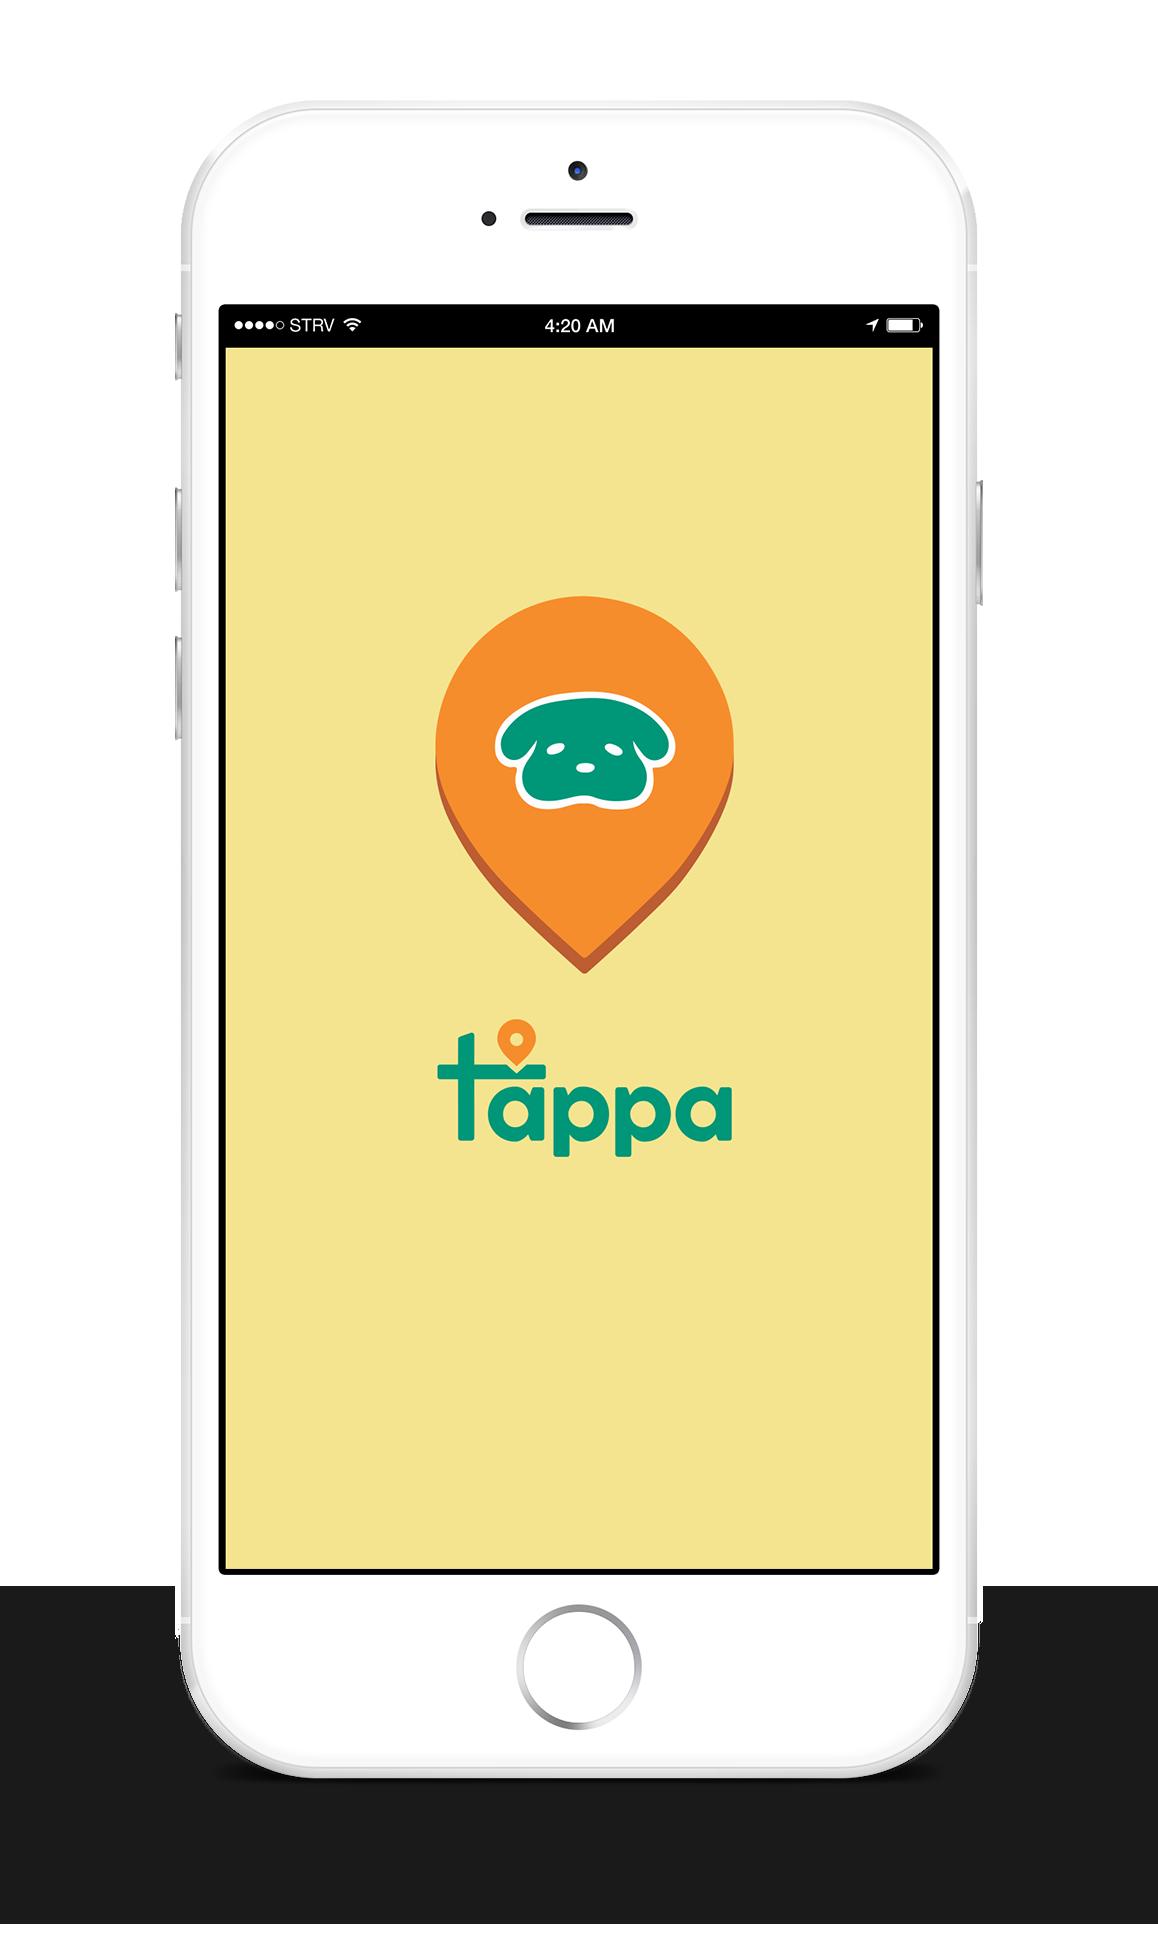 TappaAppMockupLaunch